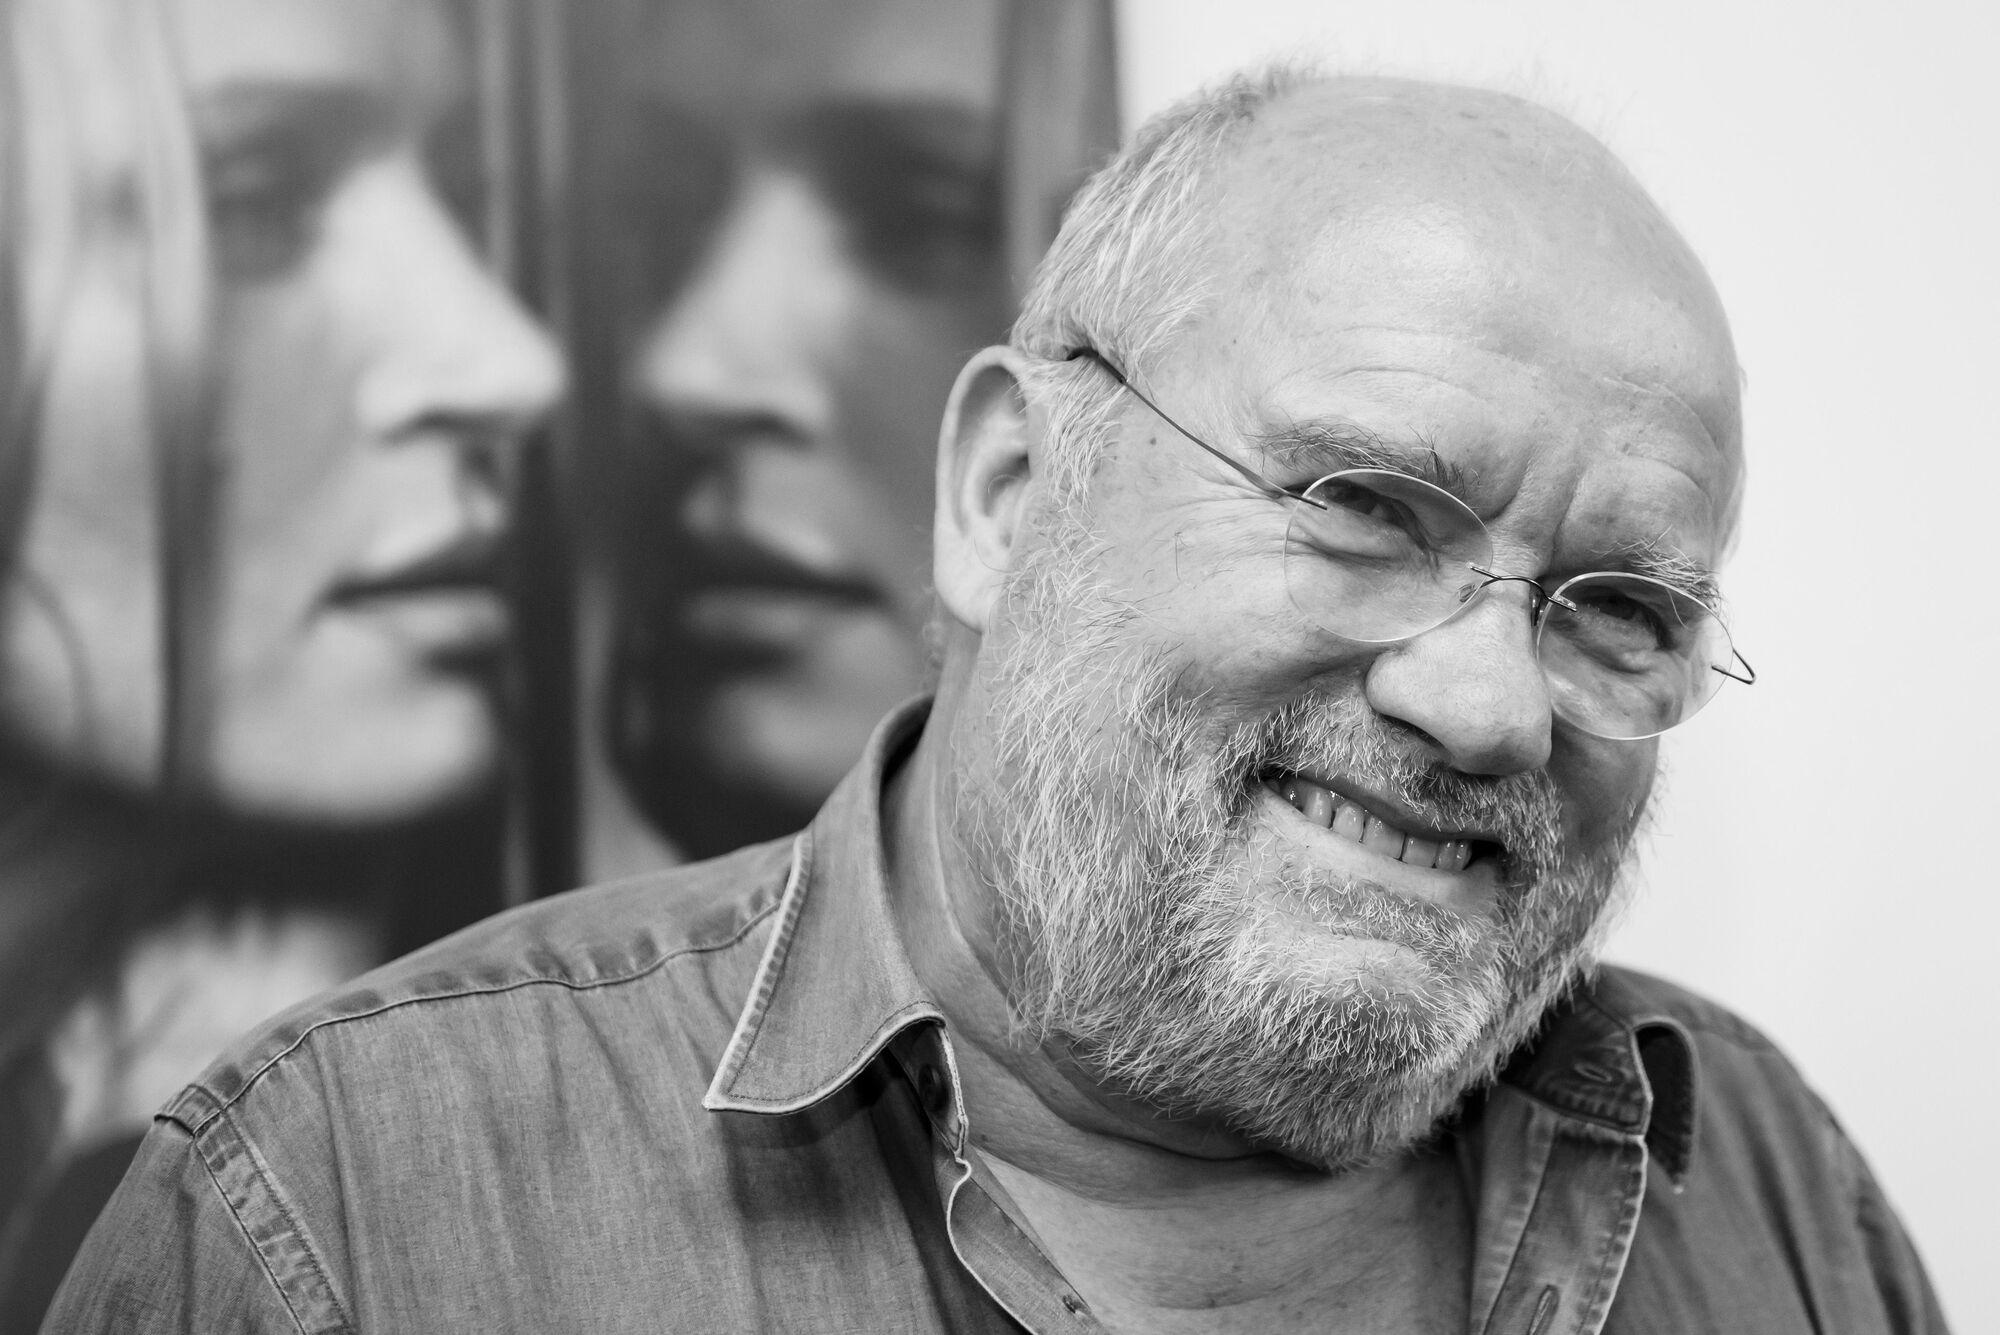 peter lidnberg halála cidny crawford naomi campbell